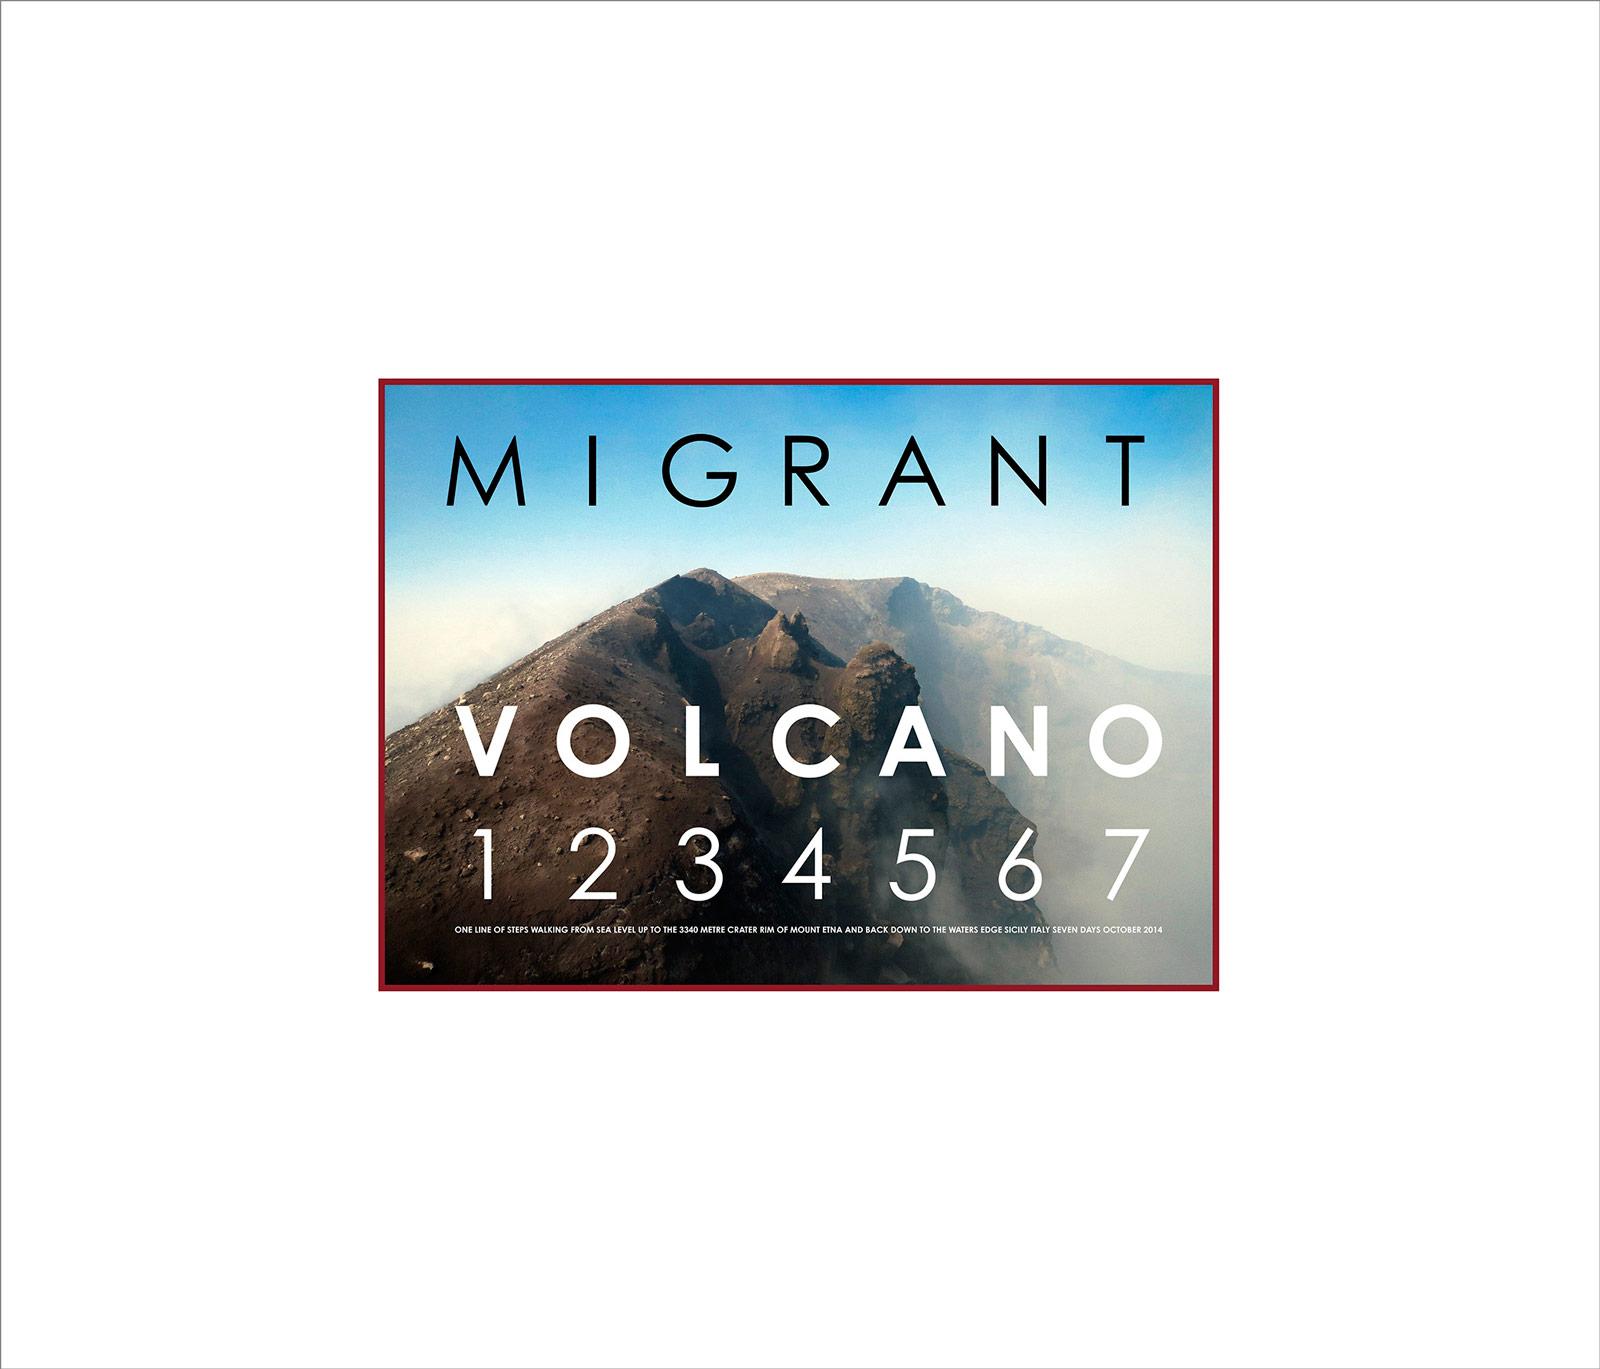 Migrant Volcano Sicily 2014, giclée print, 42 x 49 cm, ed 50